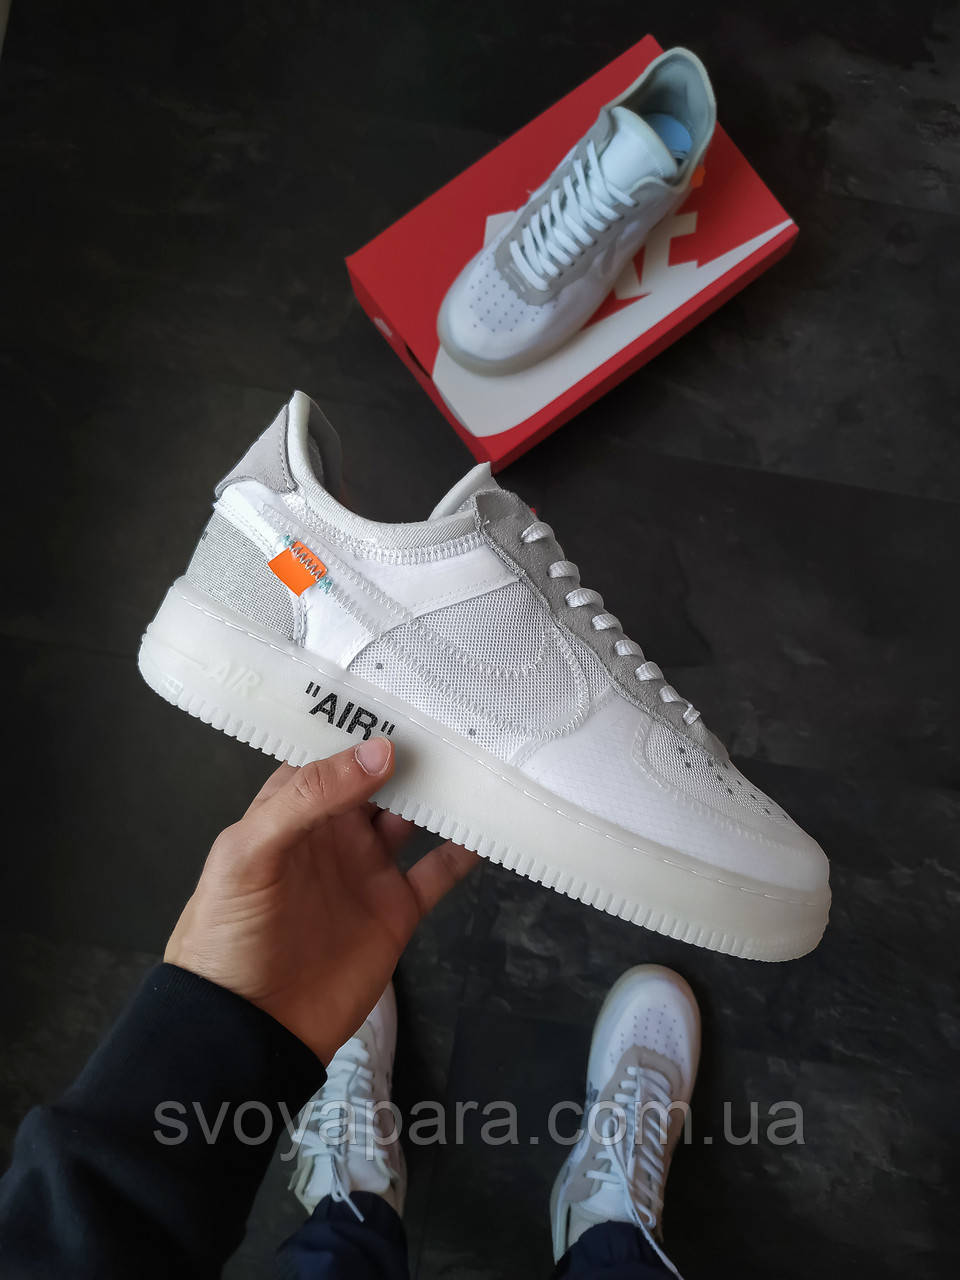 Мужские кроссовки Nike Air Force Just Do ItxOff White белые